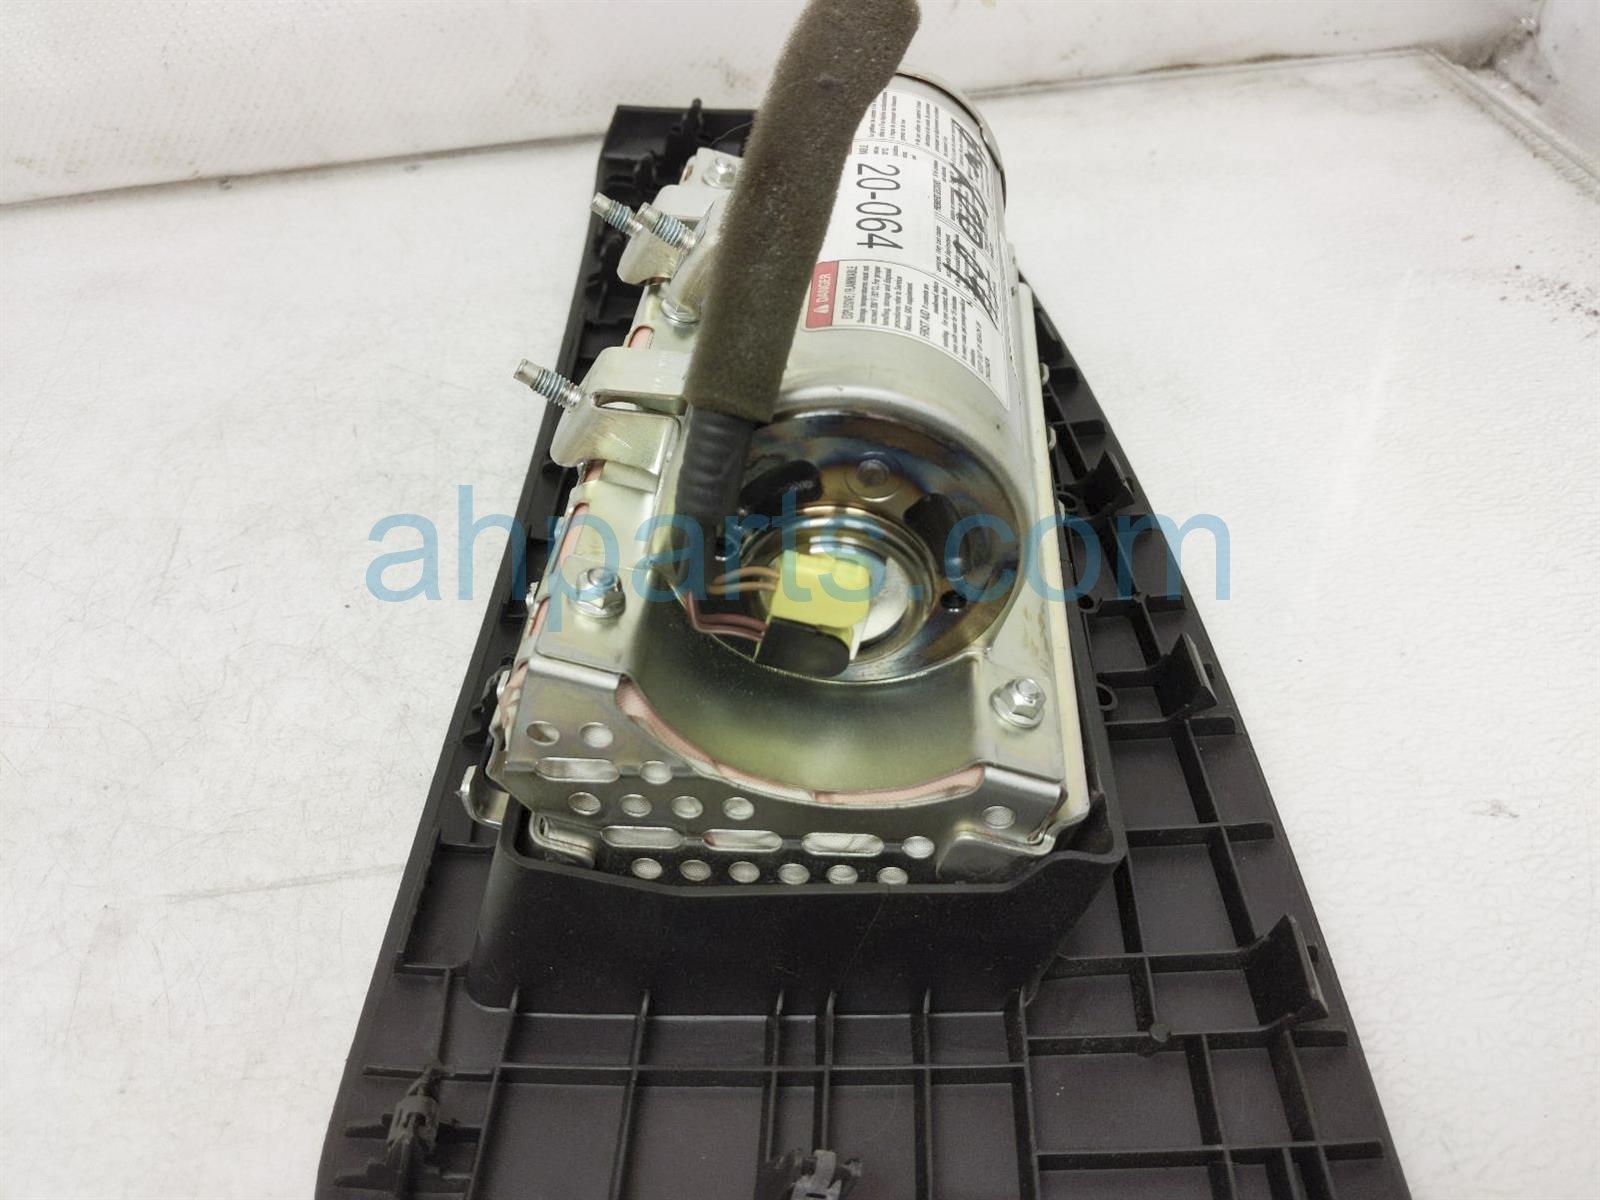 2007 Honda Accord Airbag Dashboard Air Bag   Black 06780 SDB A90 Replacement